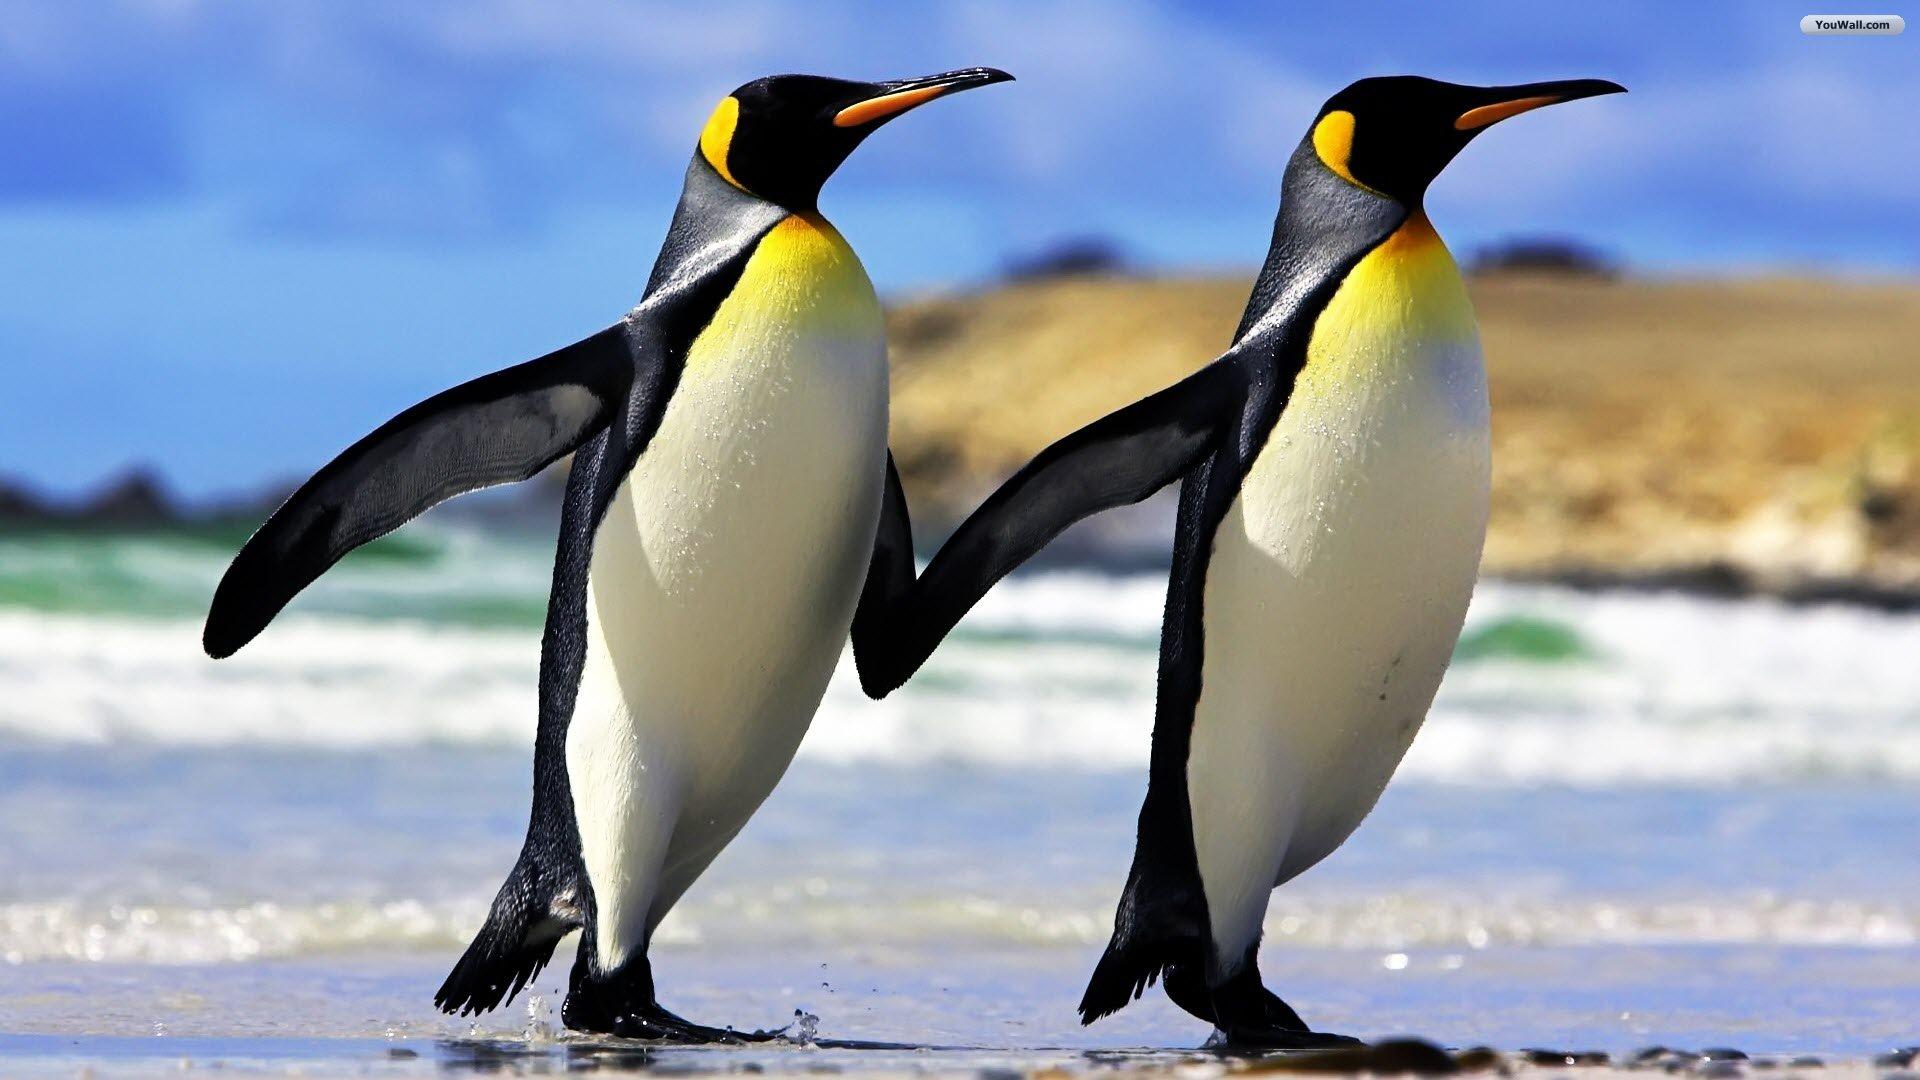 Antarctic Penguins Wallpaper